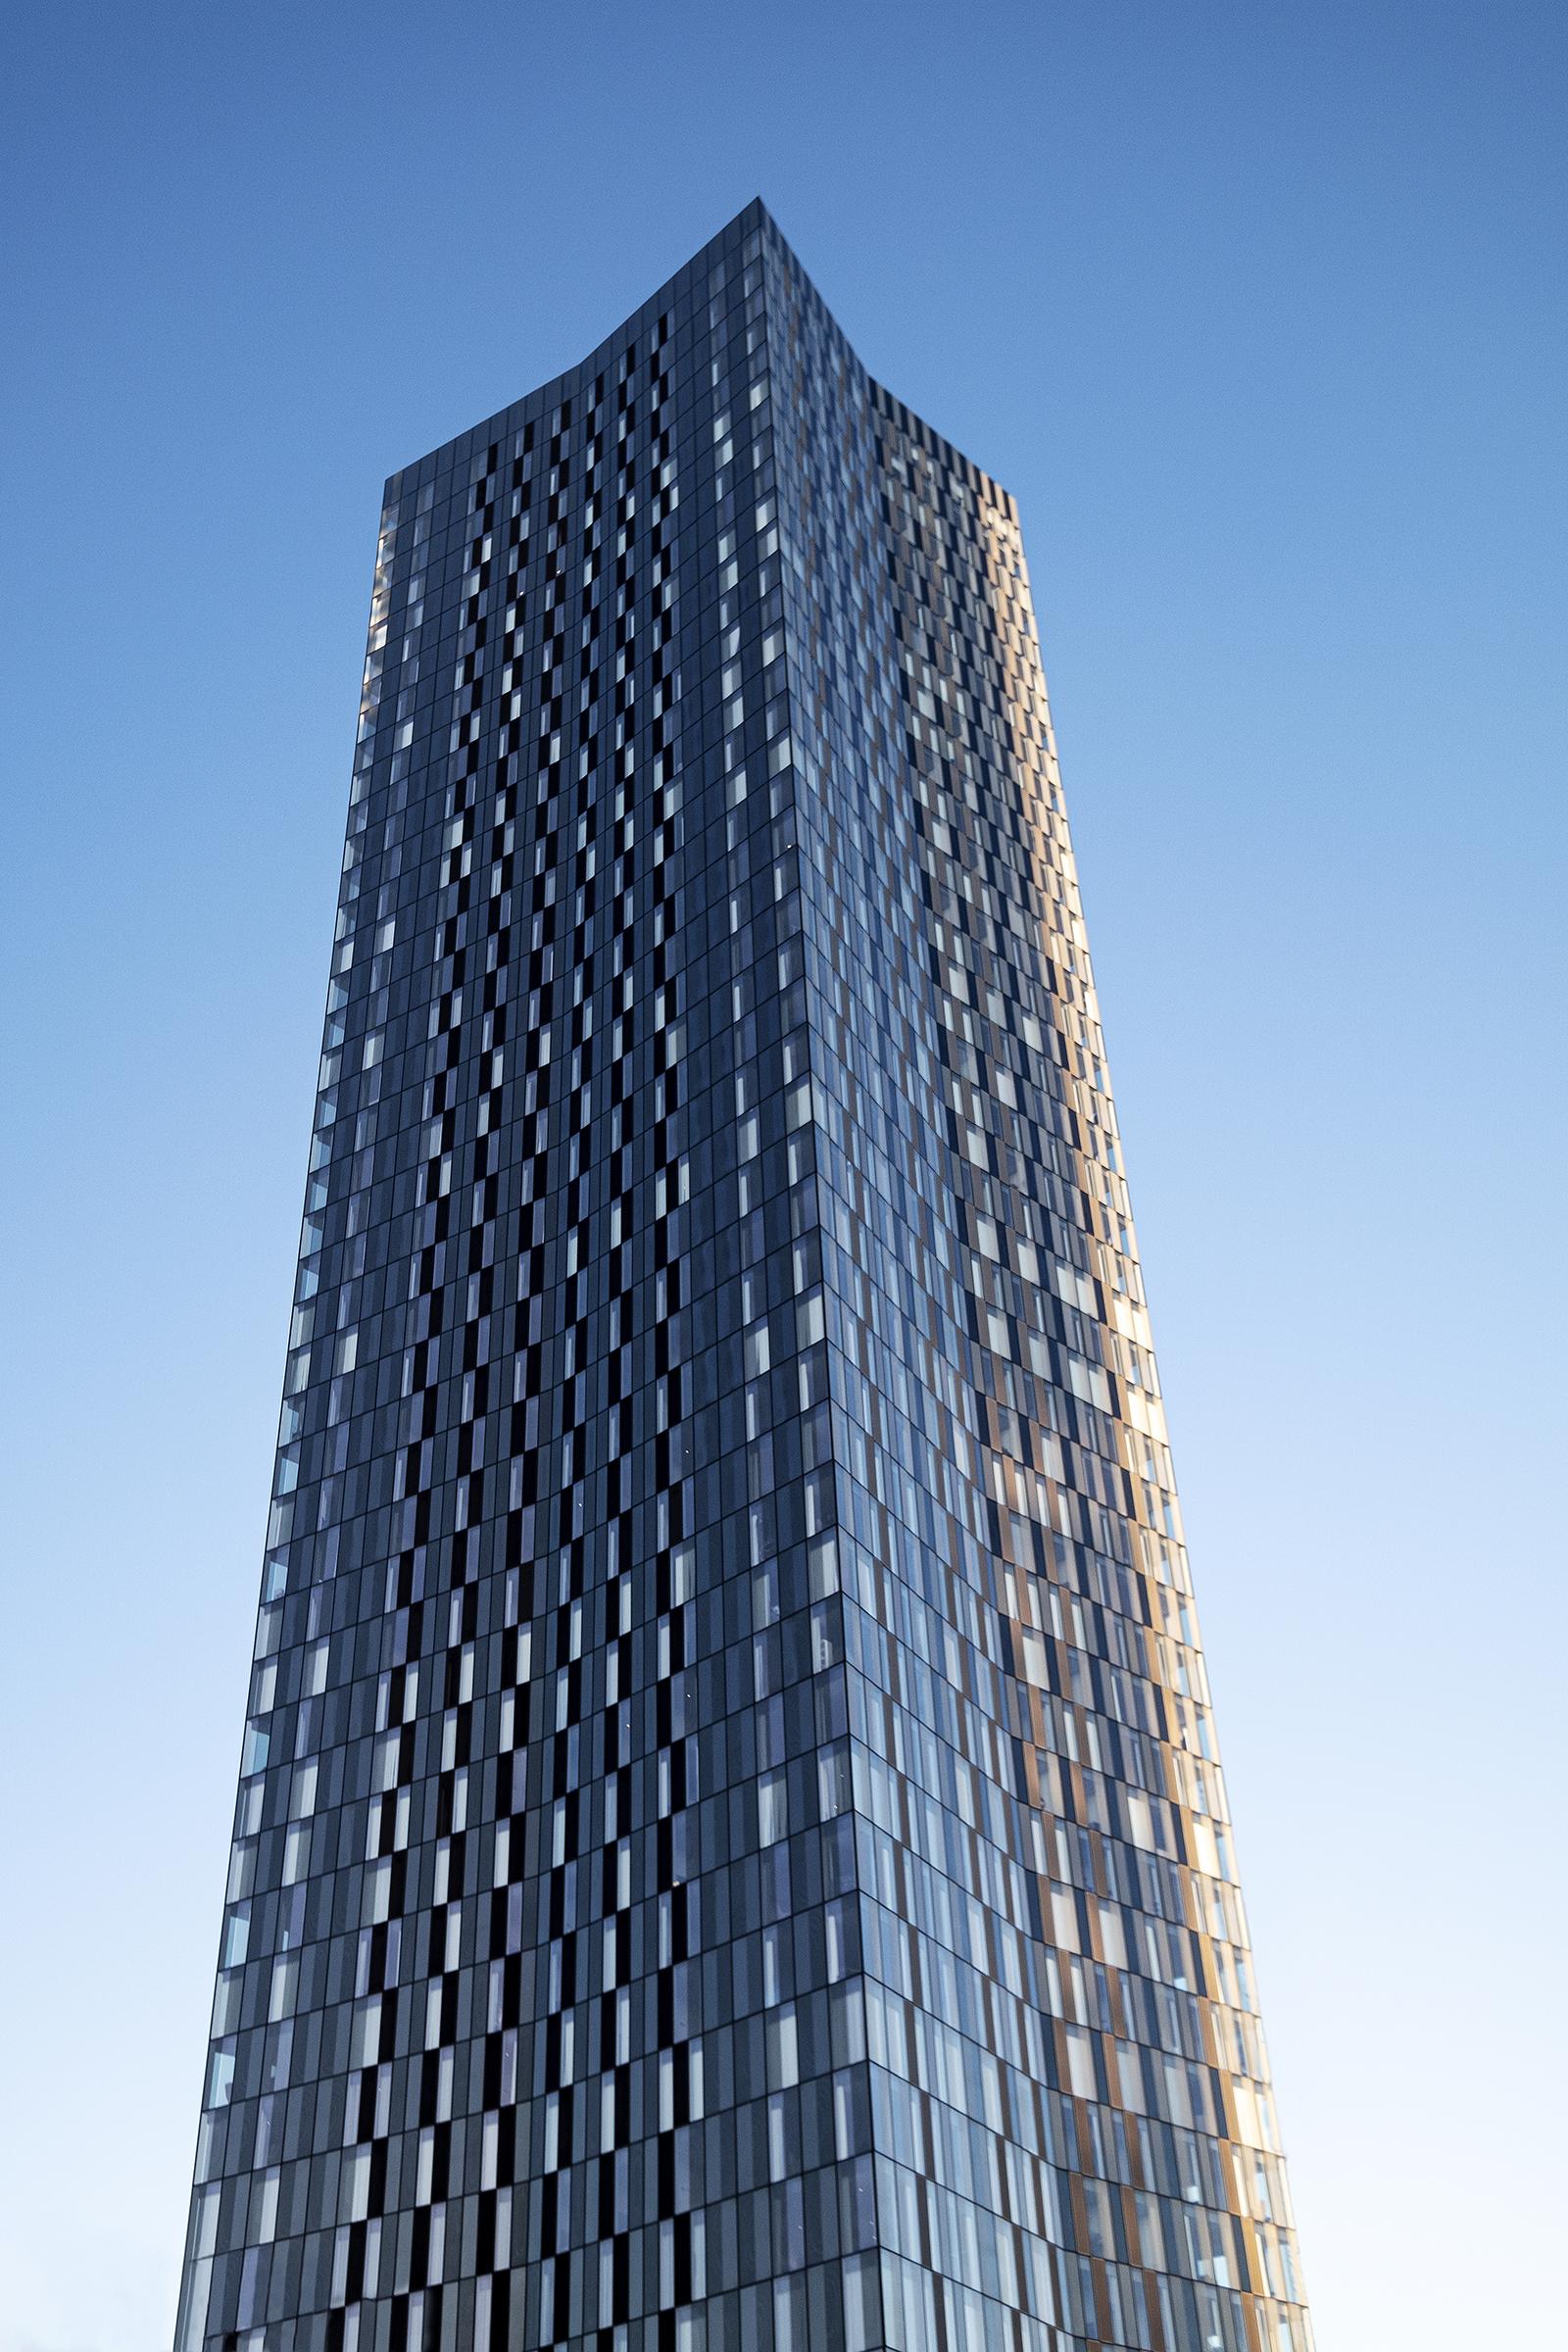 Manchester's Tallest